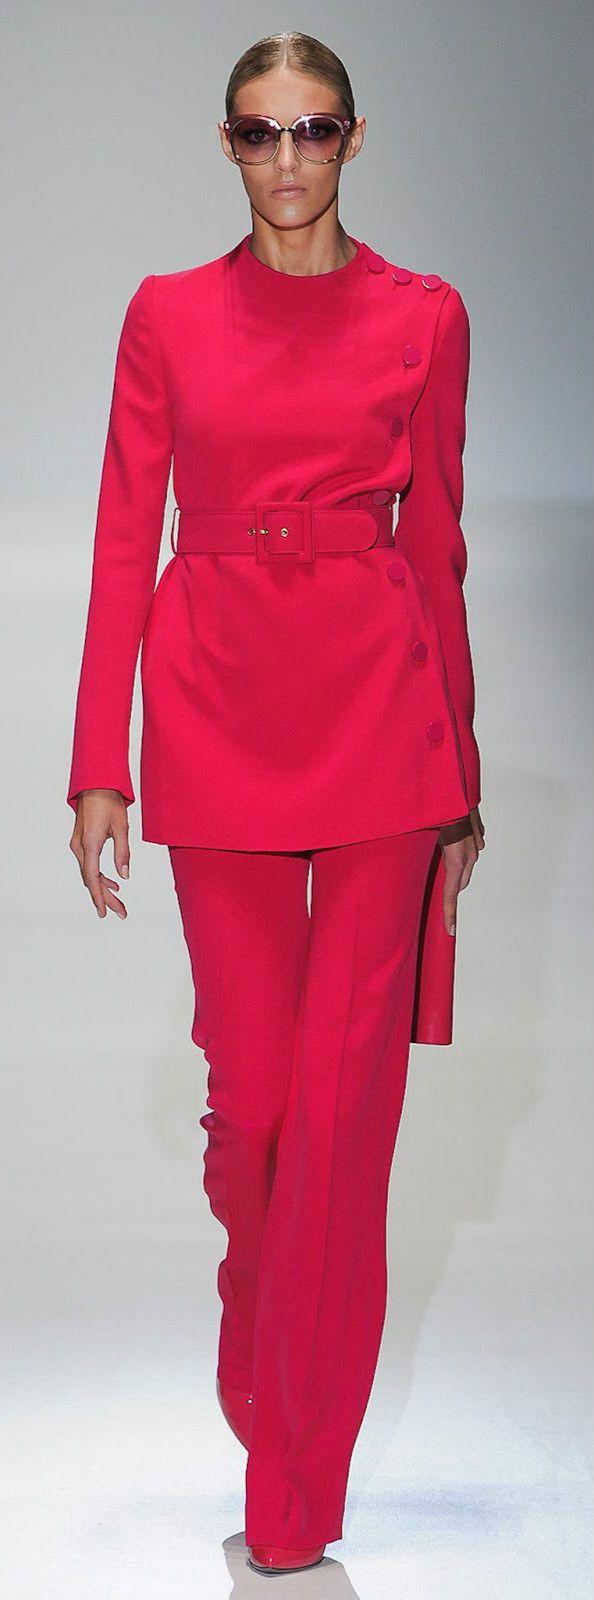 Monochromatic...bright coral pink women's asymmetrical button pant suit